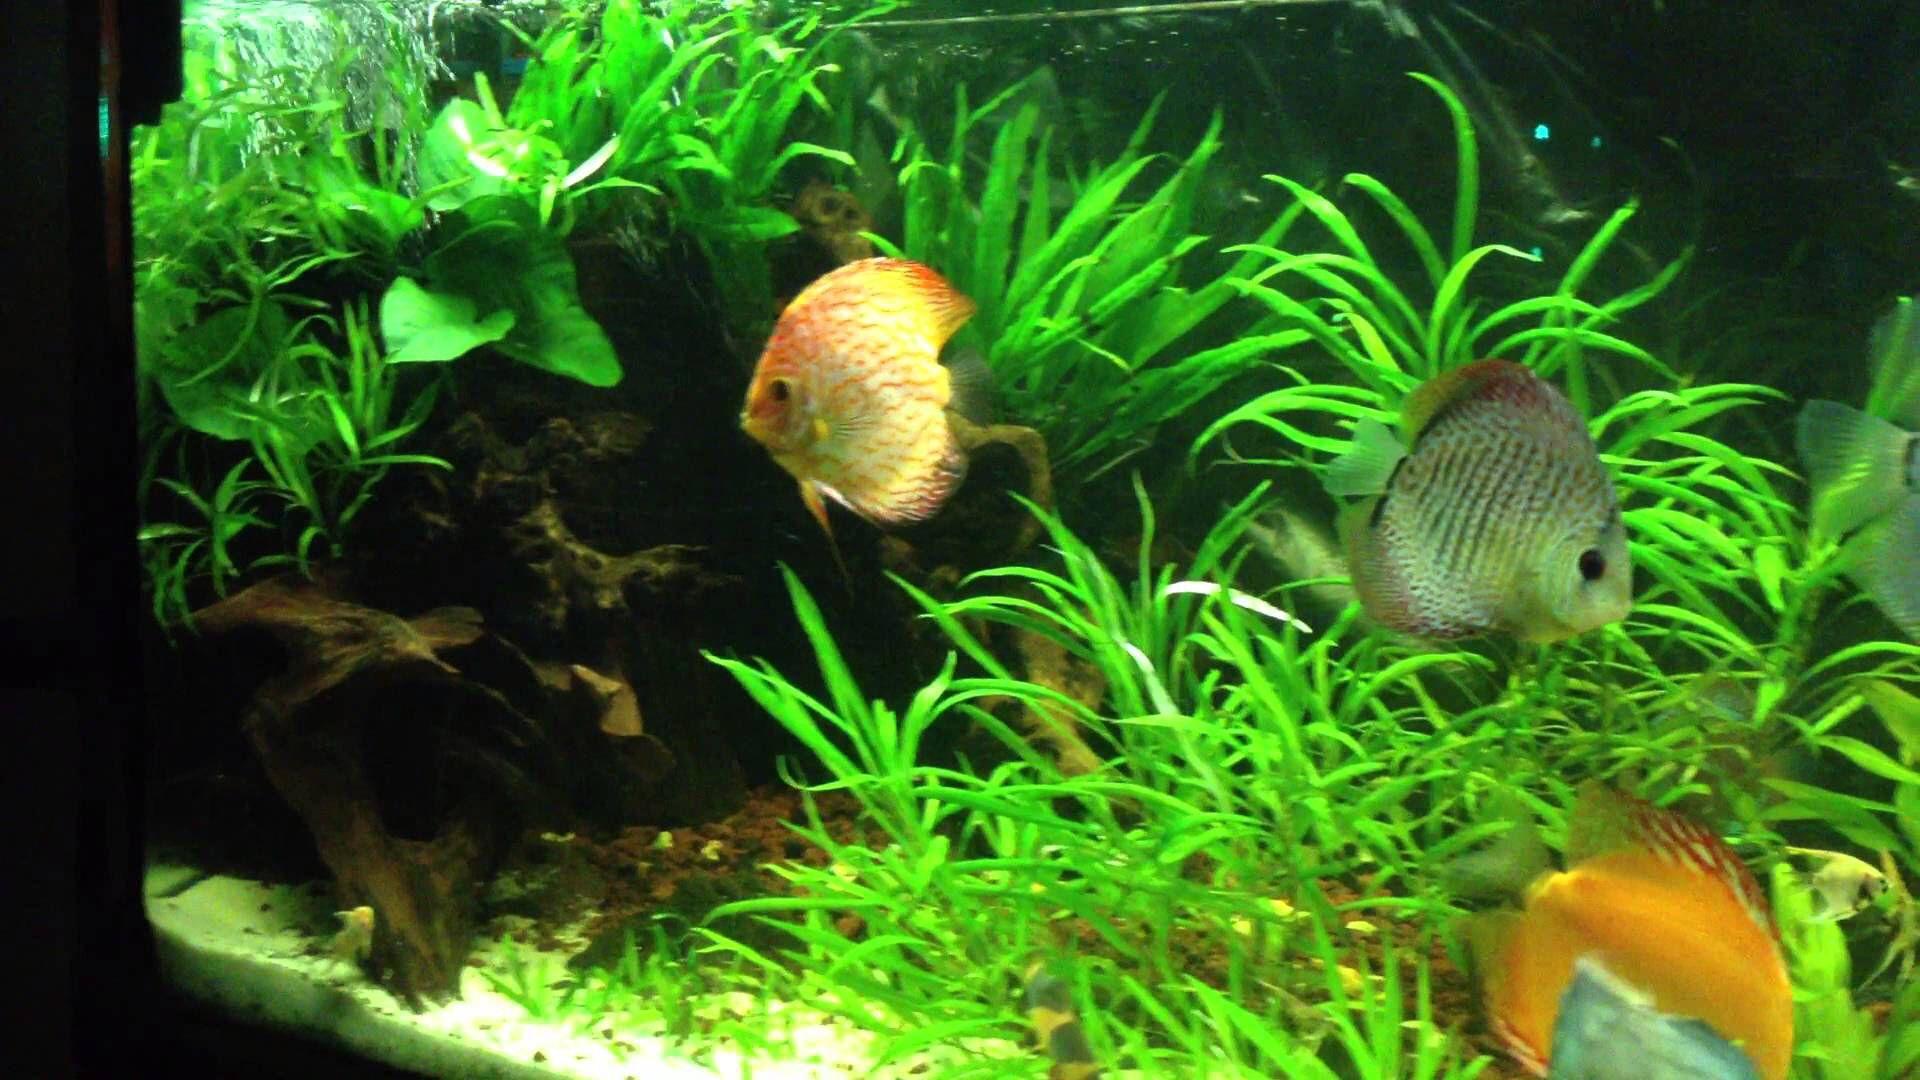 0d264feb0fd3c590830d9e78d2cfa7e6 Frais De Aquarium Tropical Schème